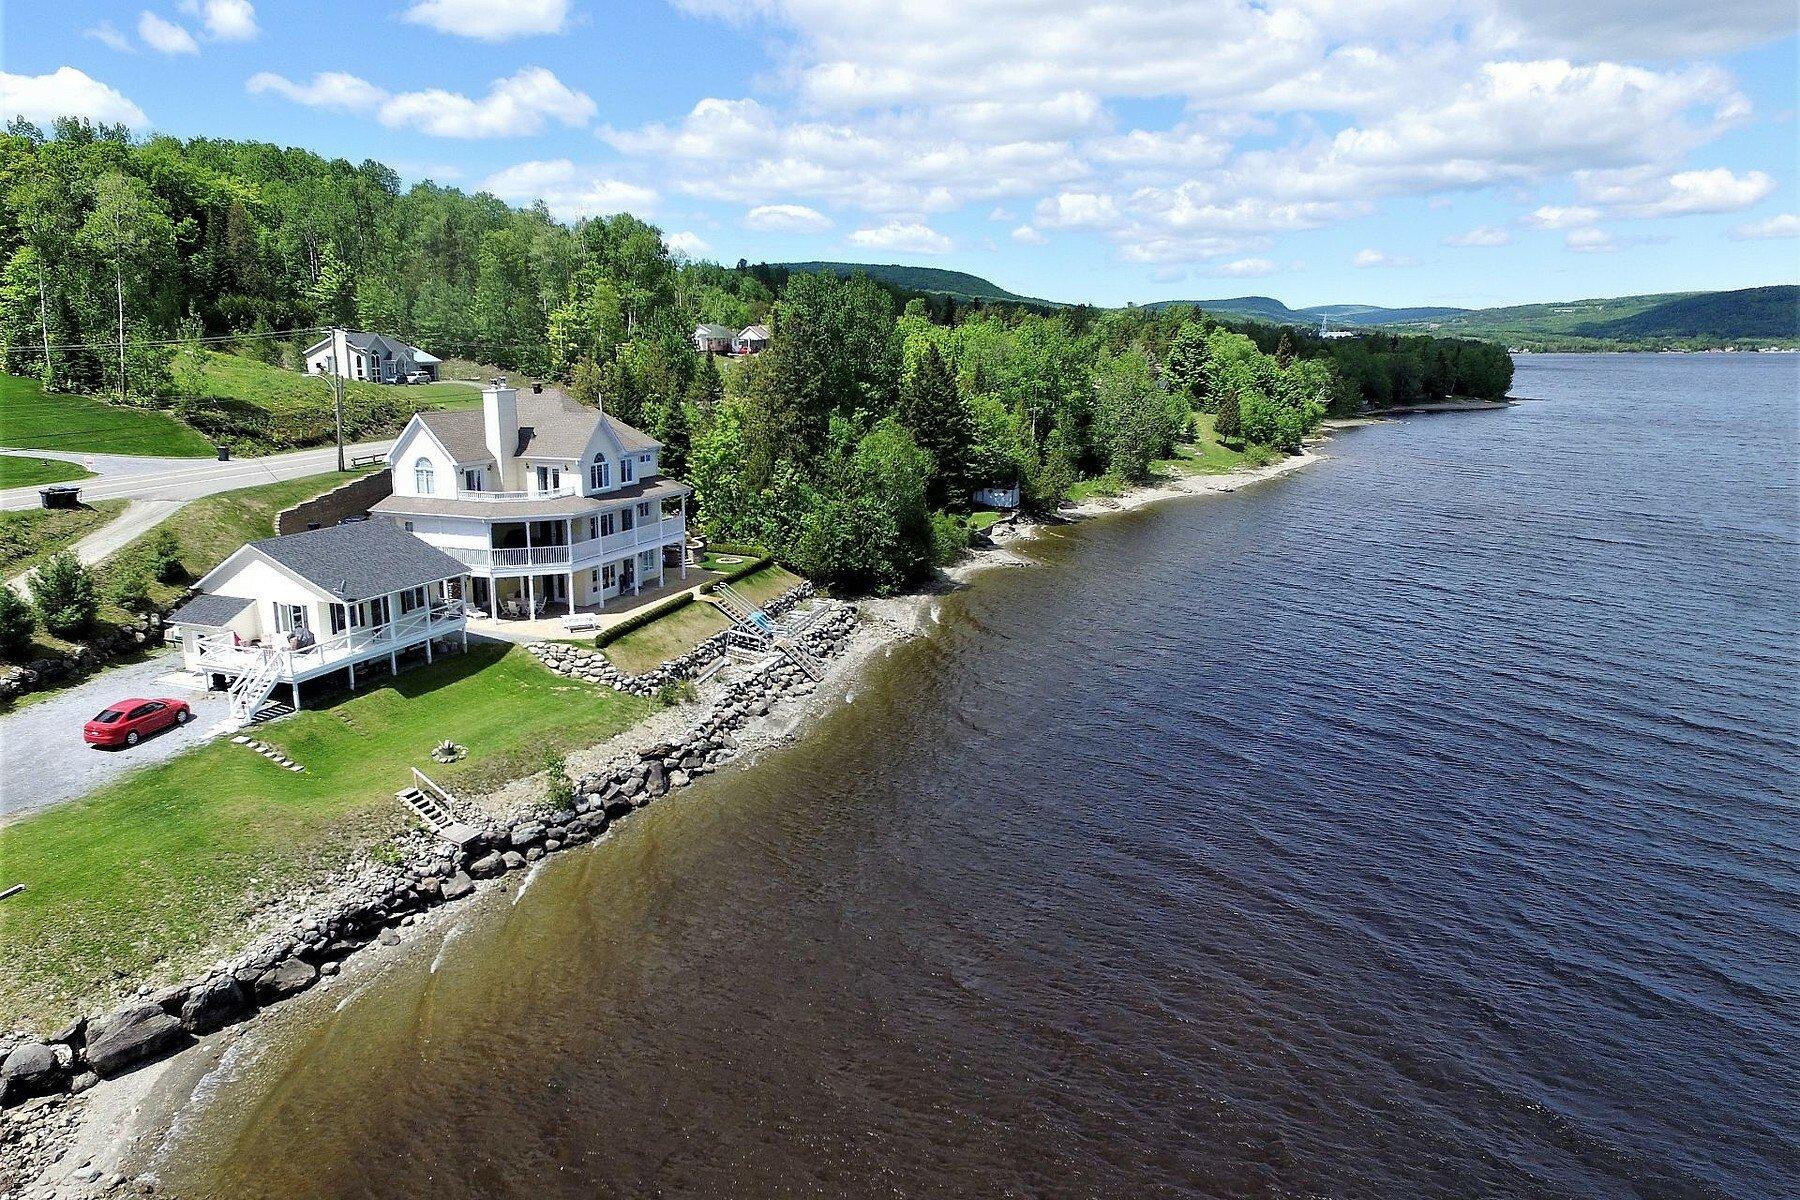 House in Pohenegamook, Quebec, Canada 1